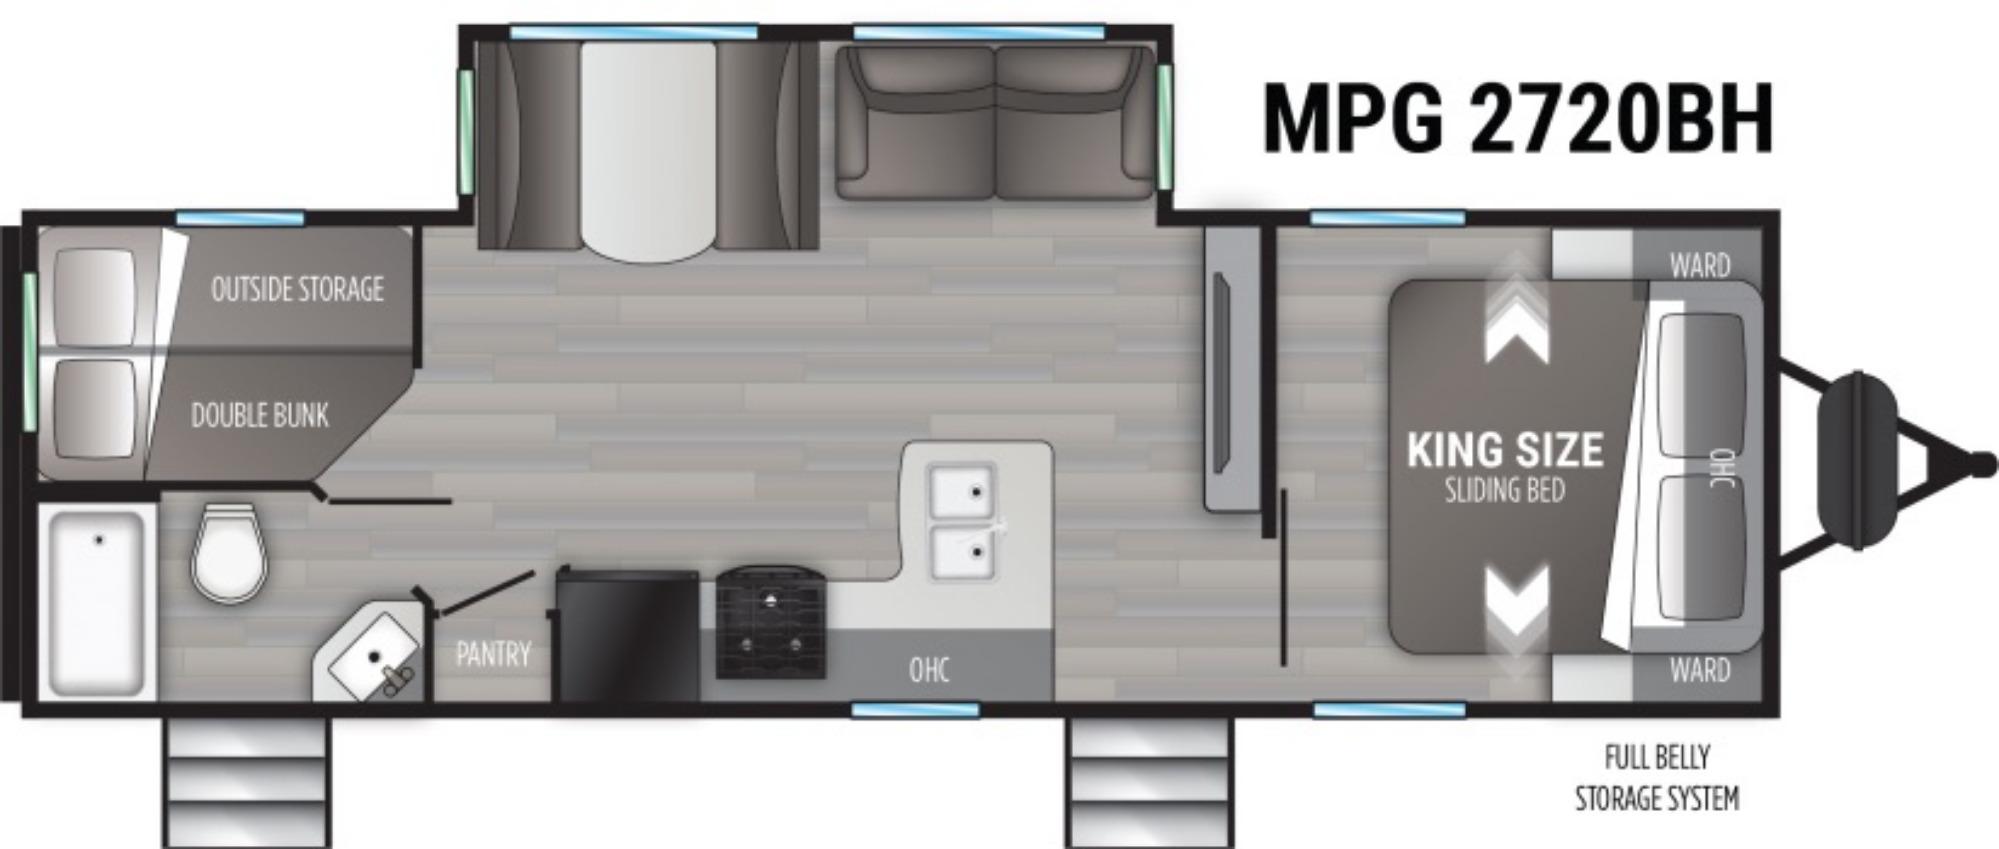 View Floor Plan for 2021 CRUISER RV MPG 2720BH